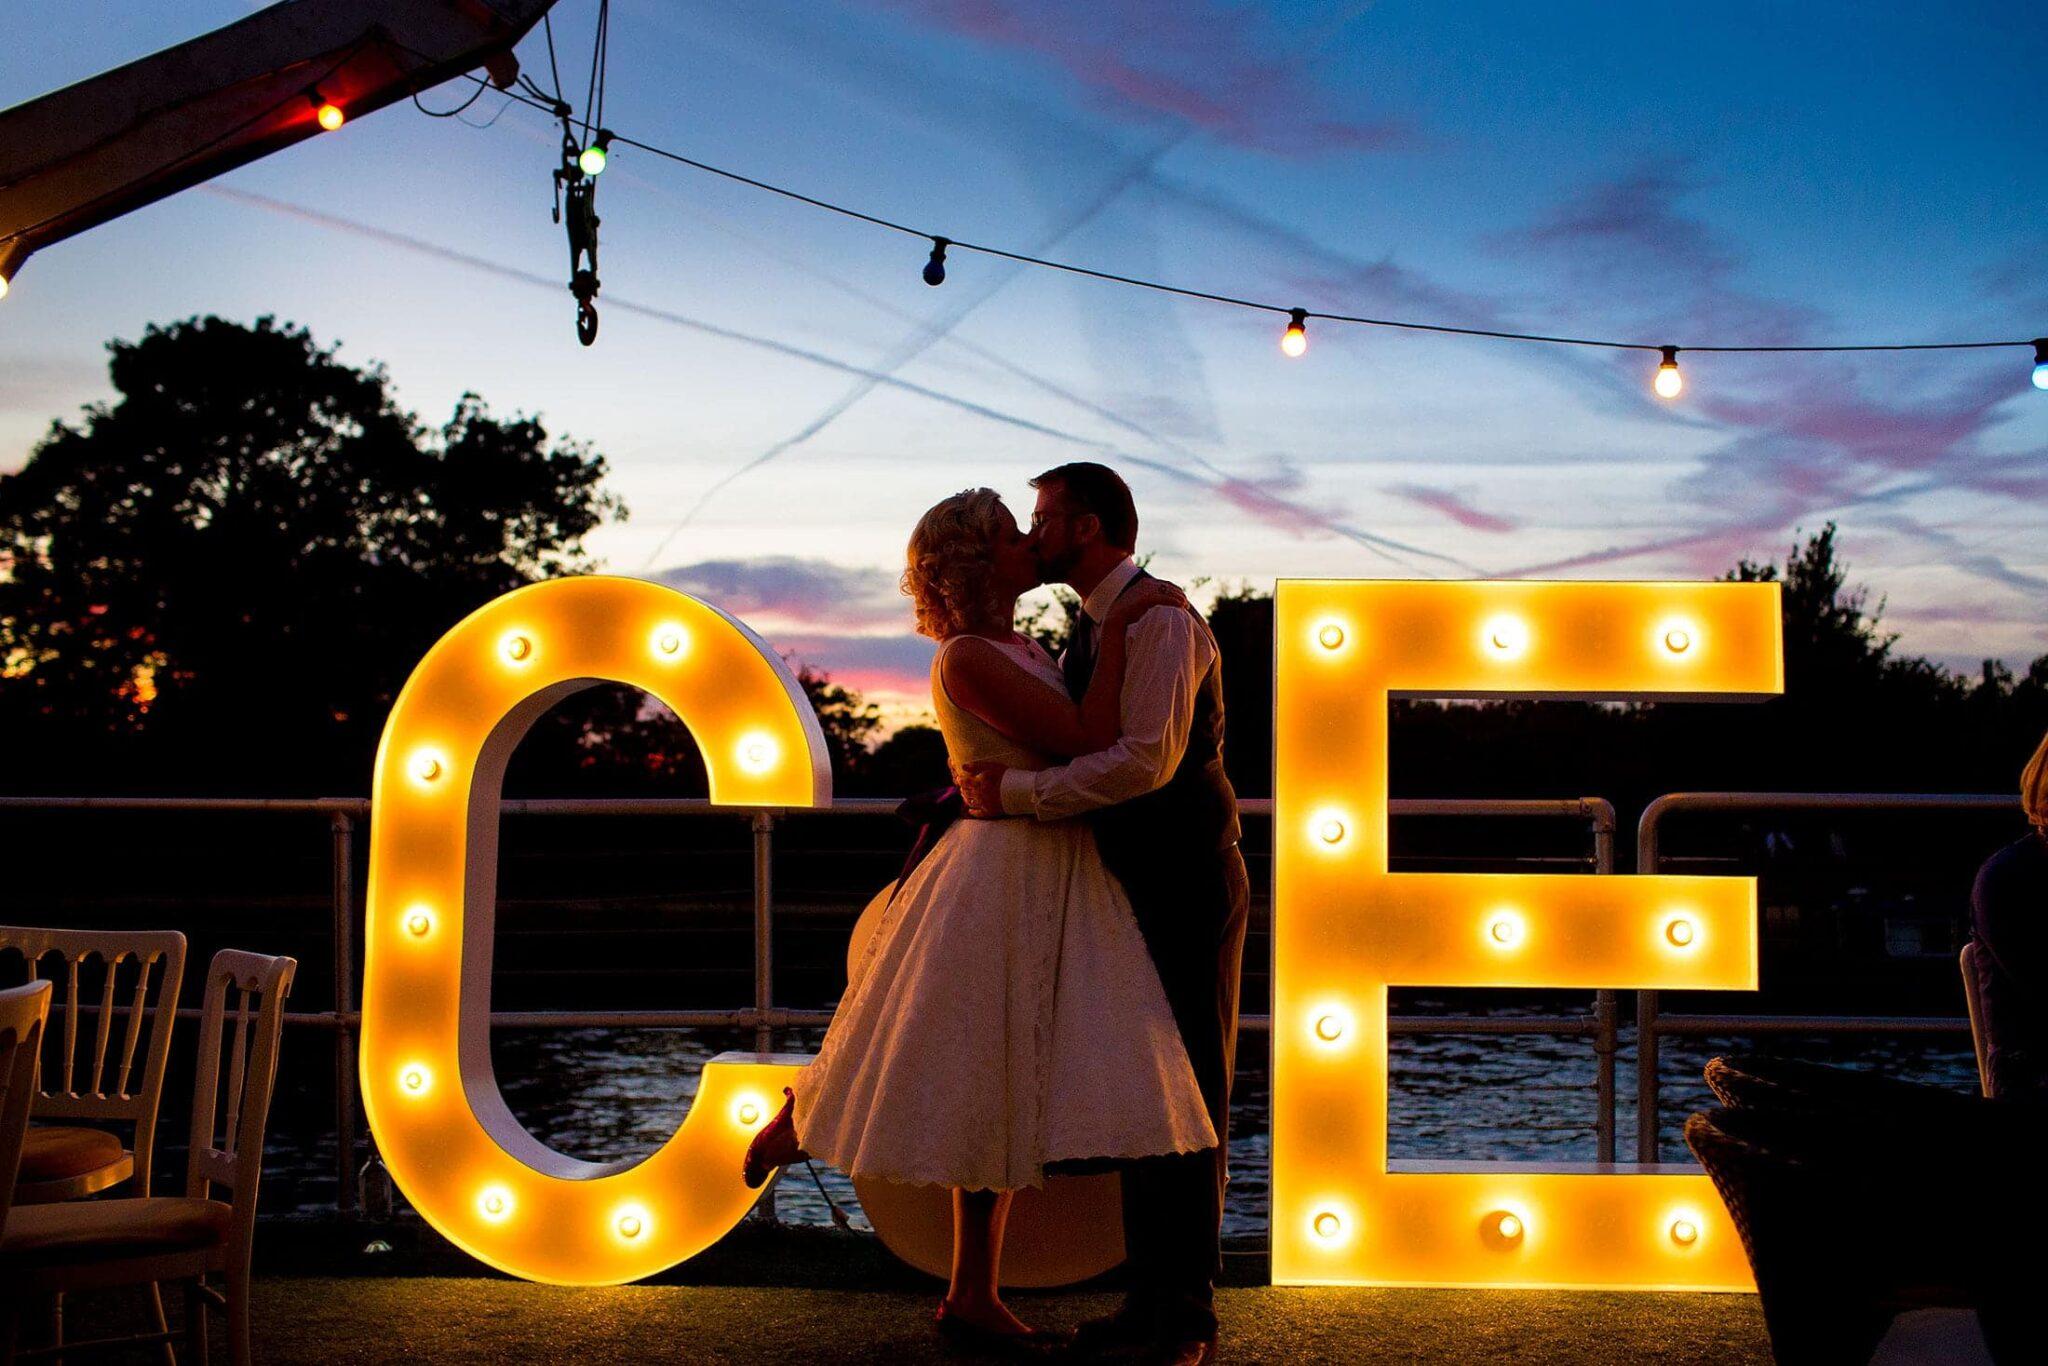 Ravens Ait wedding photos of Claire & Ed